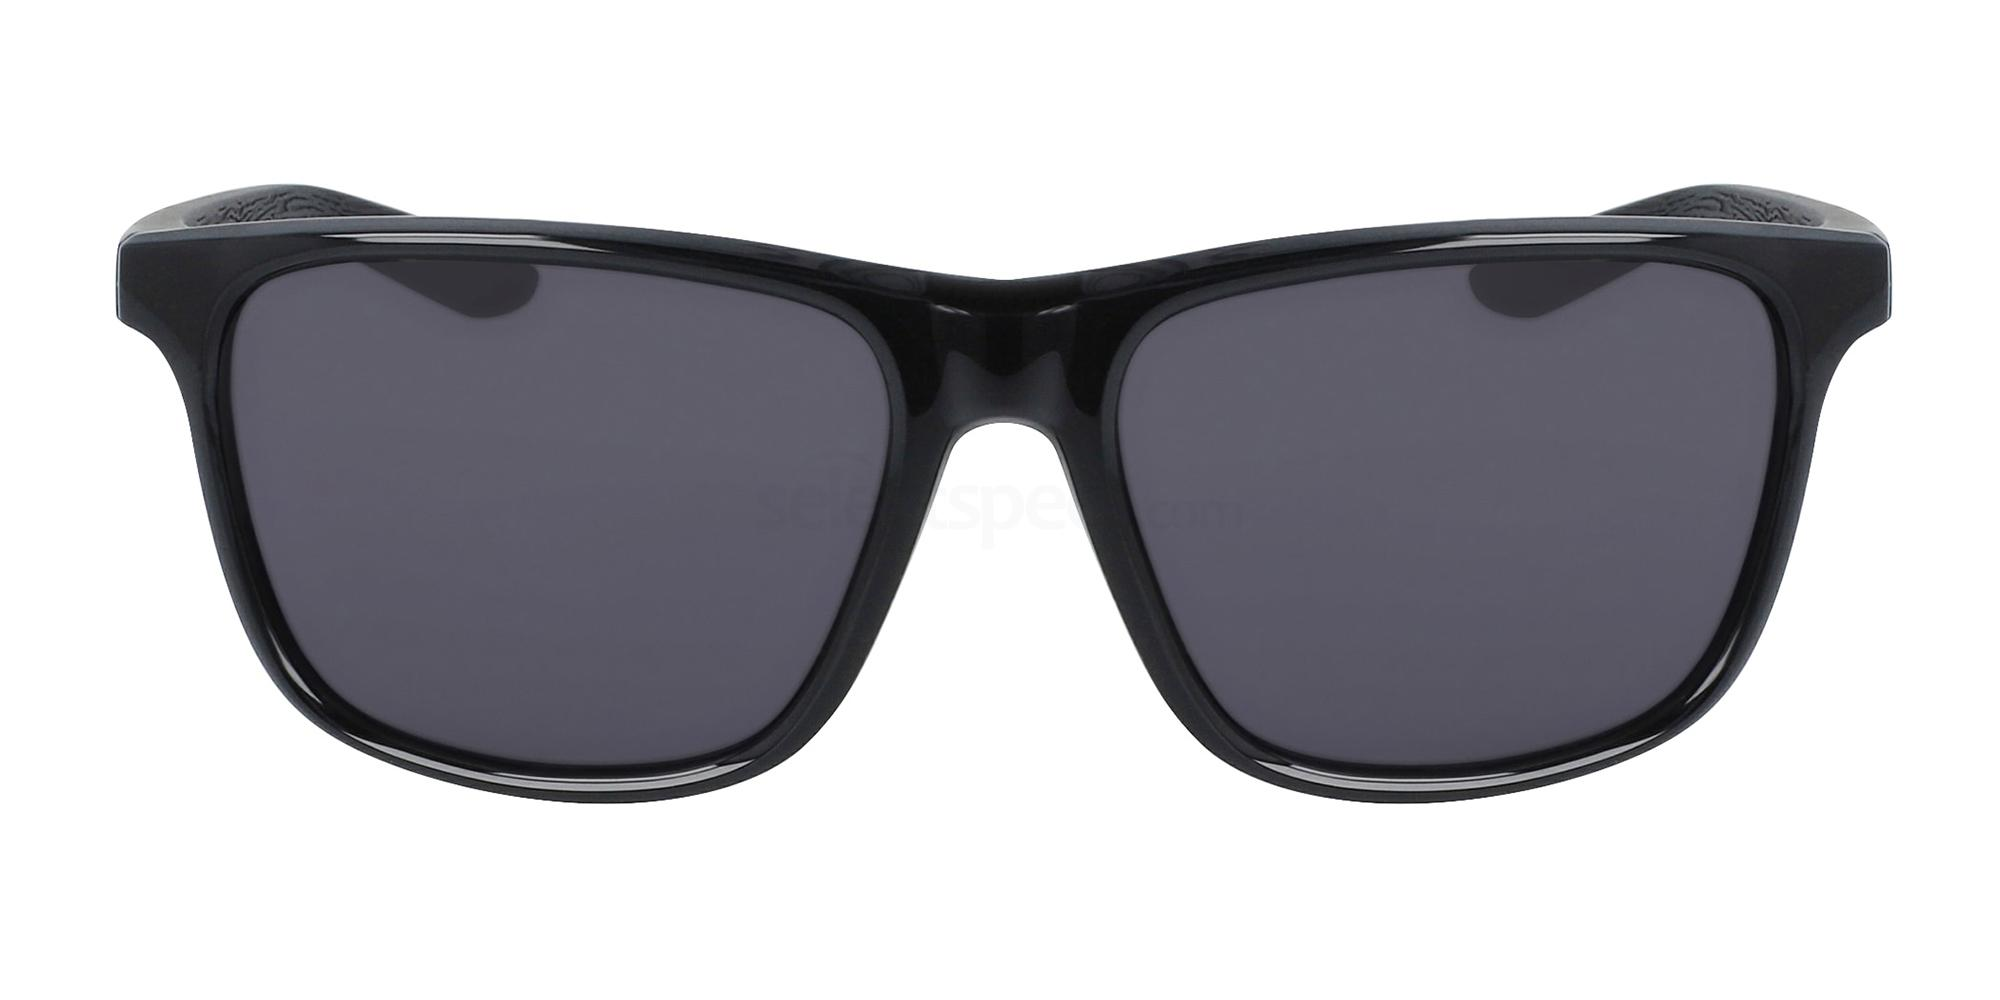 010 NIKE FLIP ASCENT DJ9930 Sunglasses, Nike KIDS